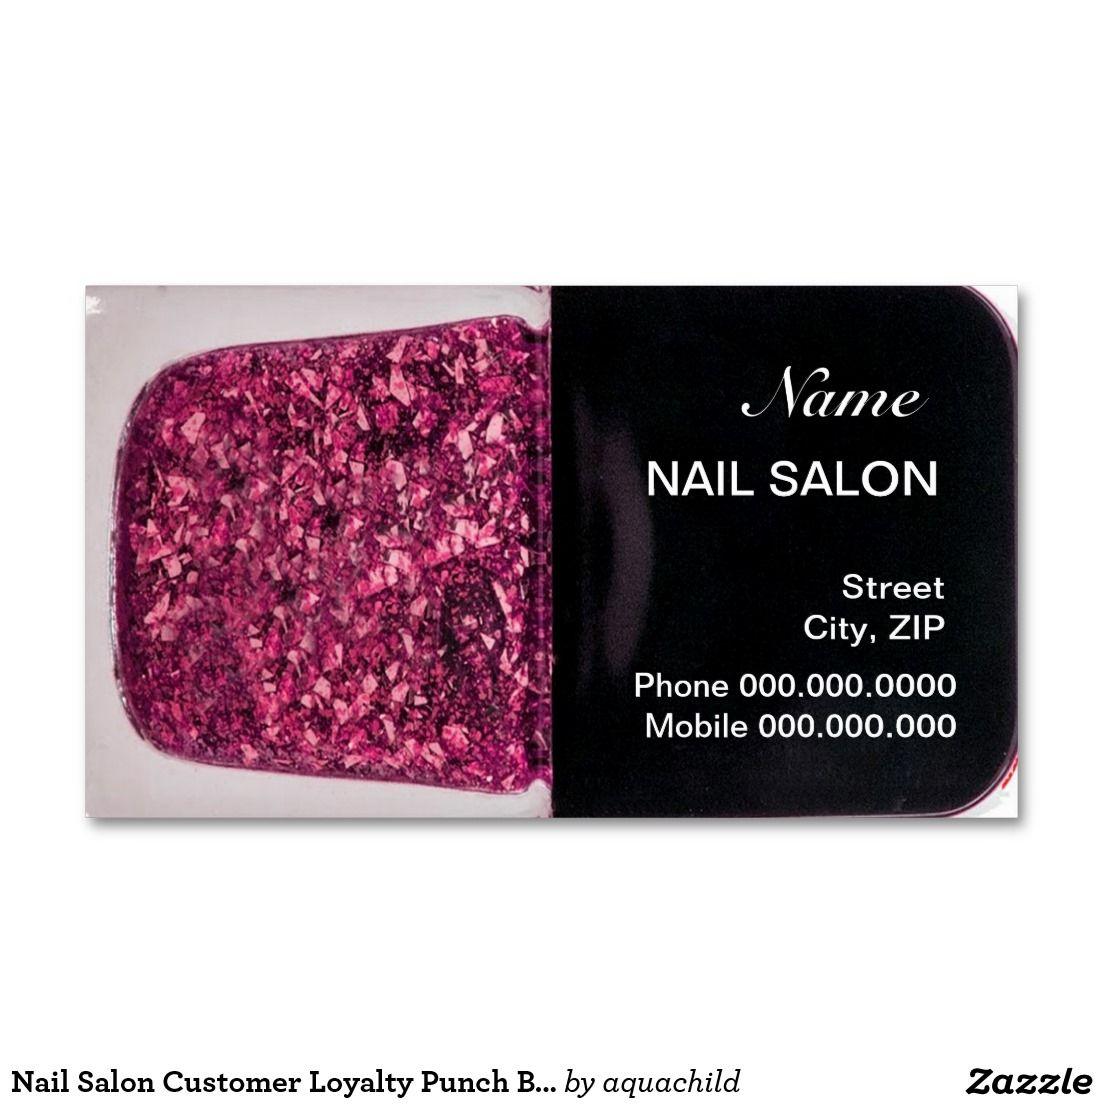 Nail Salon Customer Loyalty Punch Business Card | Customized Nail ...